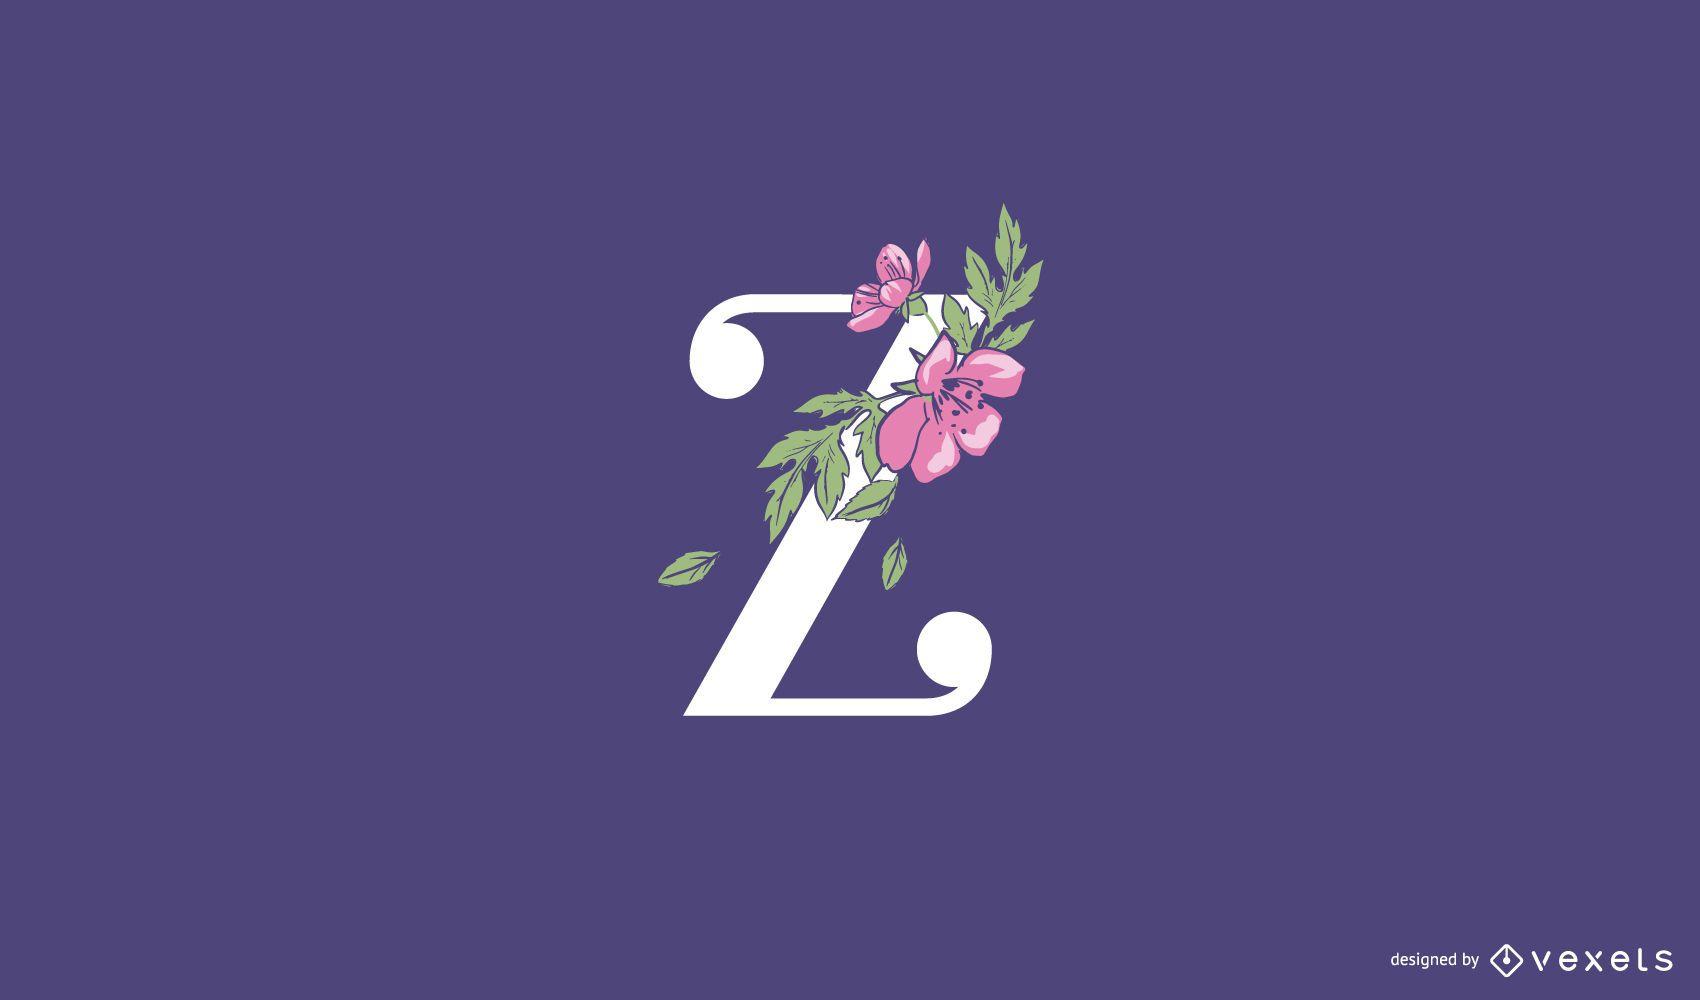 Floral letter z logo template